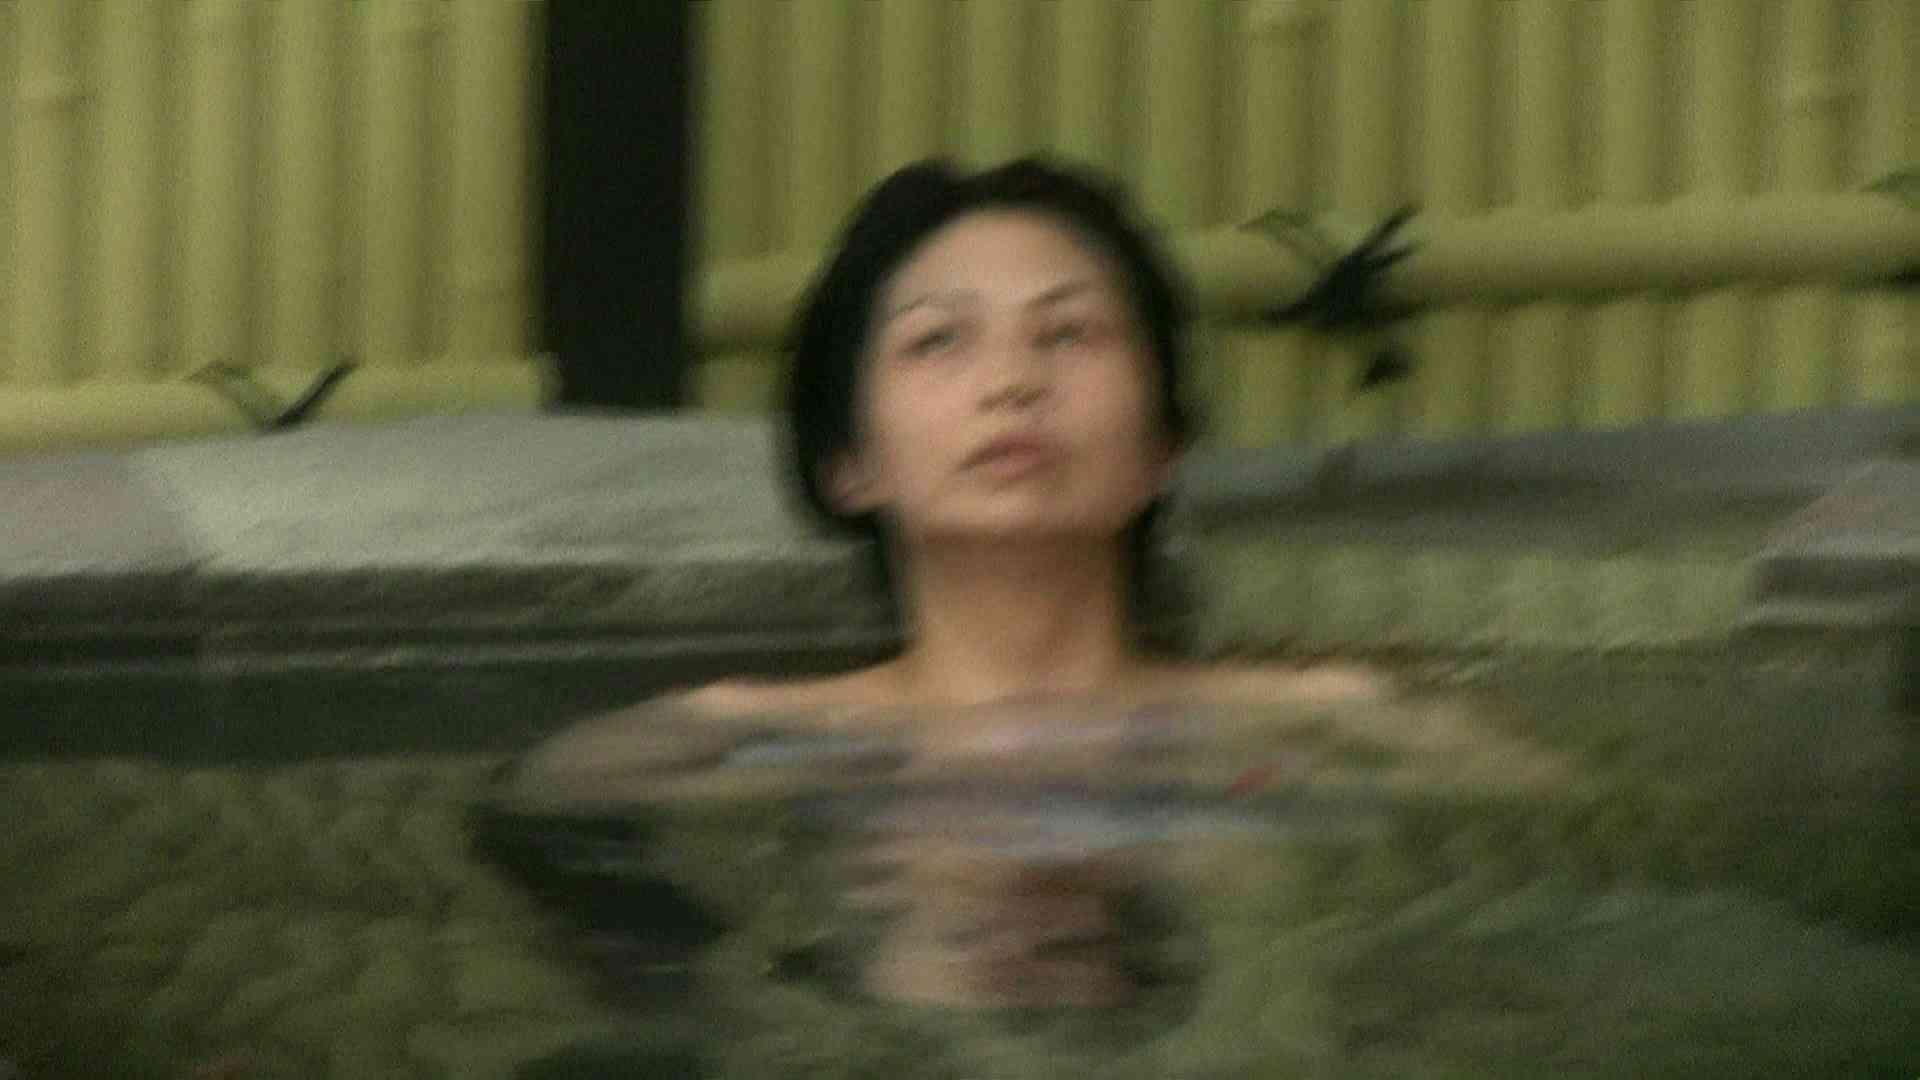 Aquaな露天風呂Vol.636 HなOL | 盗撮  82pic 23